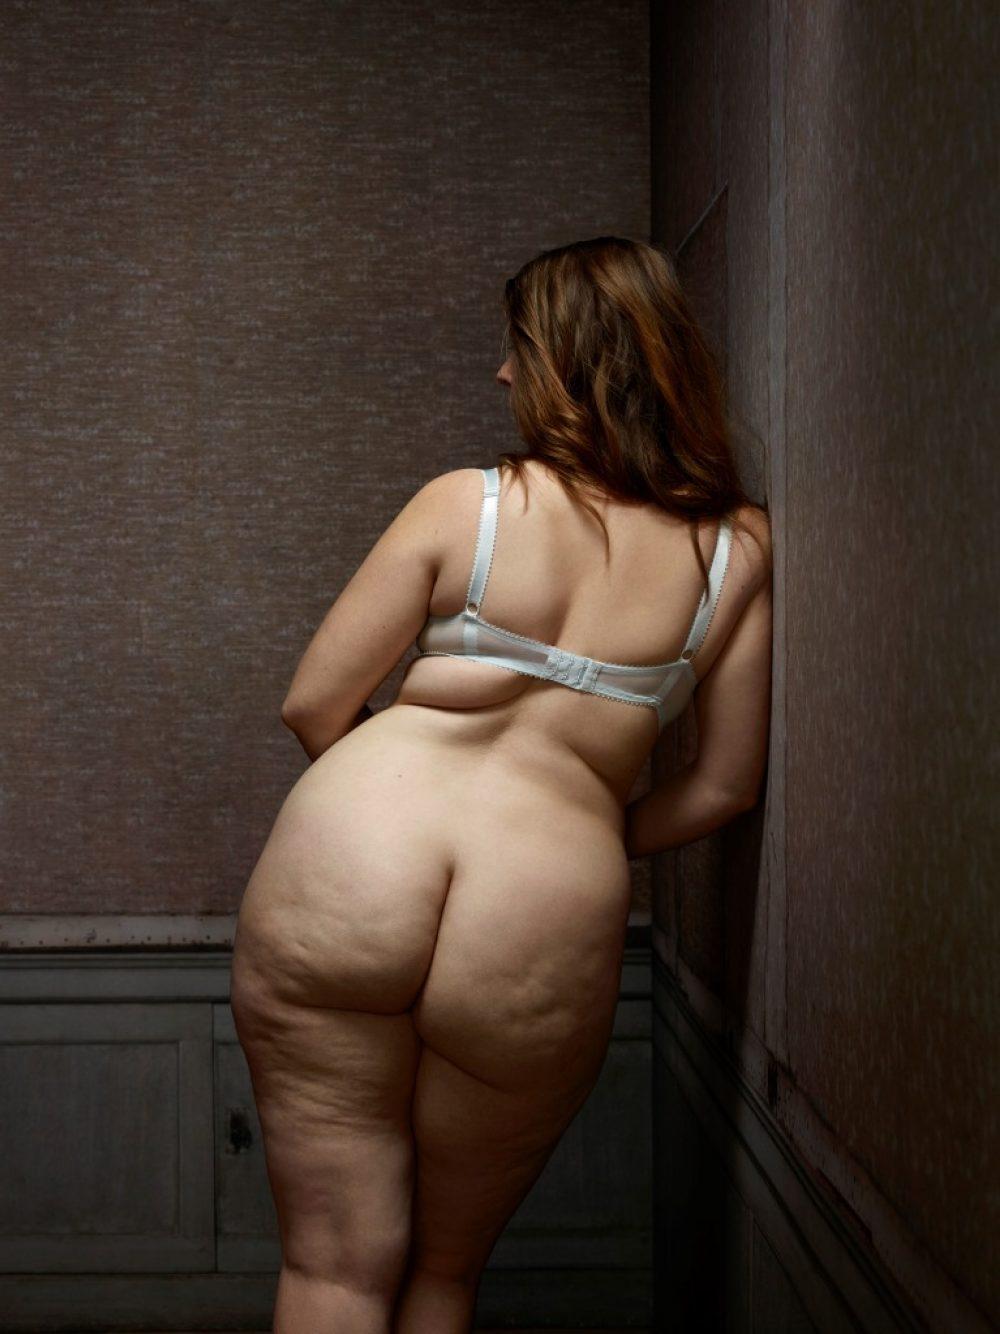 Skin Deep: Female Nude No. 16 (2015), archival print, 130 x 100 cm, Ed. 7, und 80 x 60 cm, Ed. 10